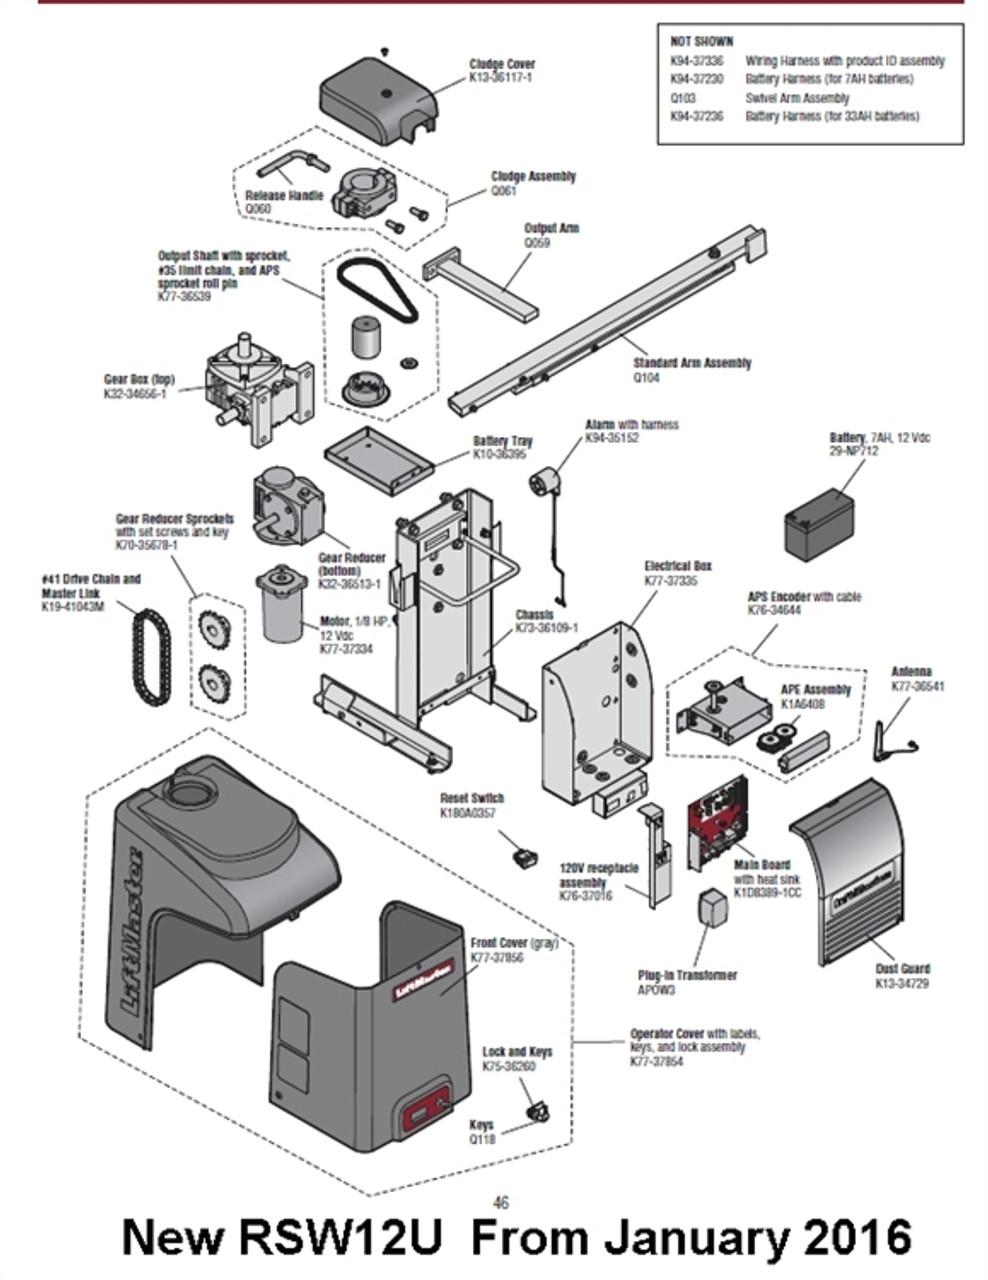 Liftmaster RSW12U parts breakdown